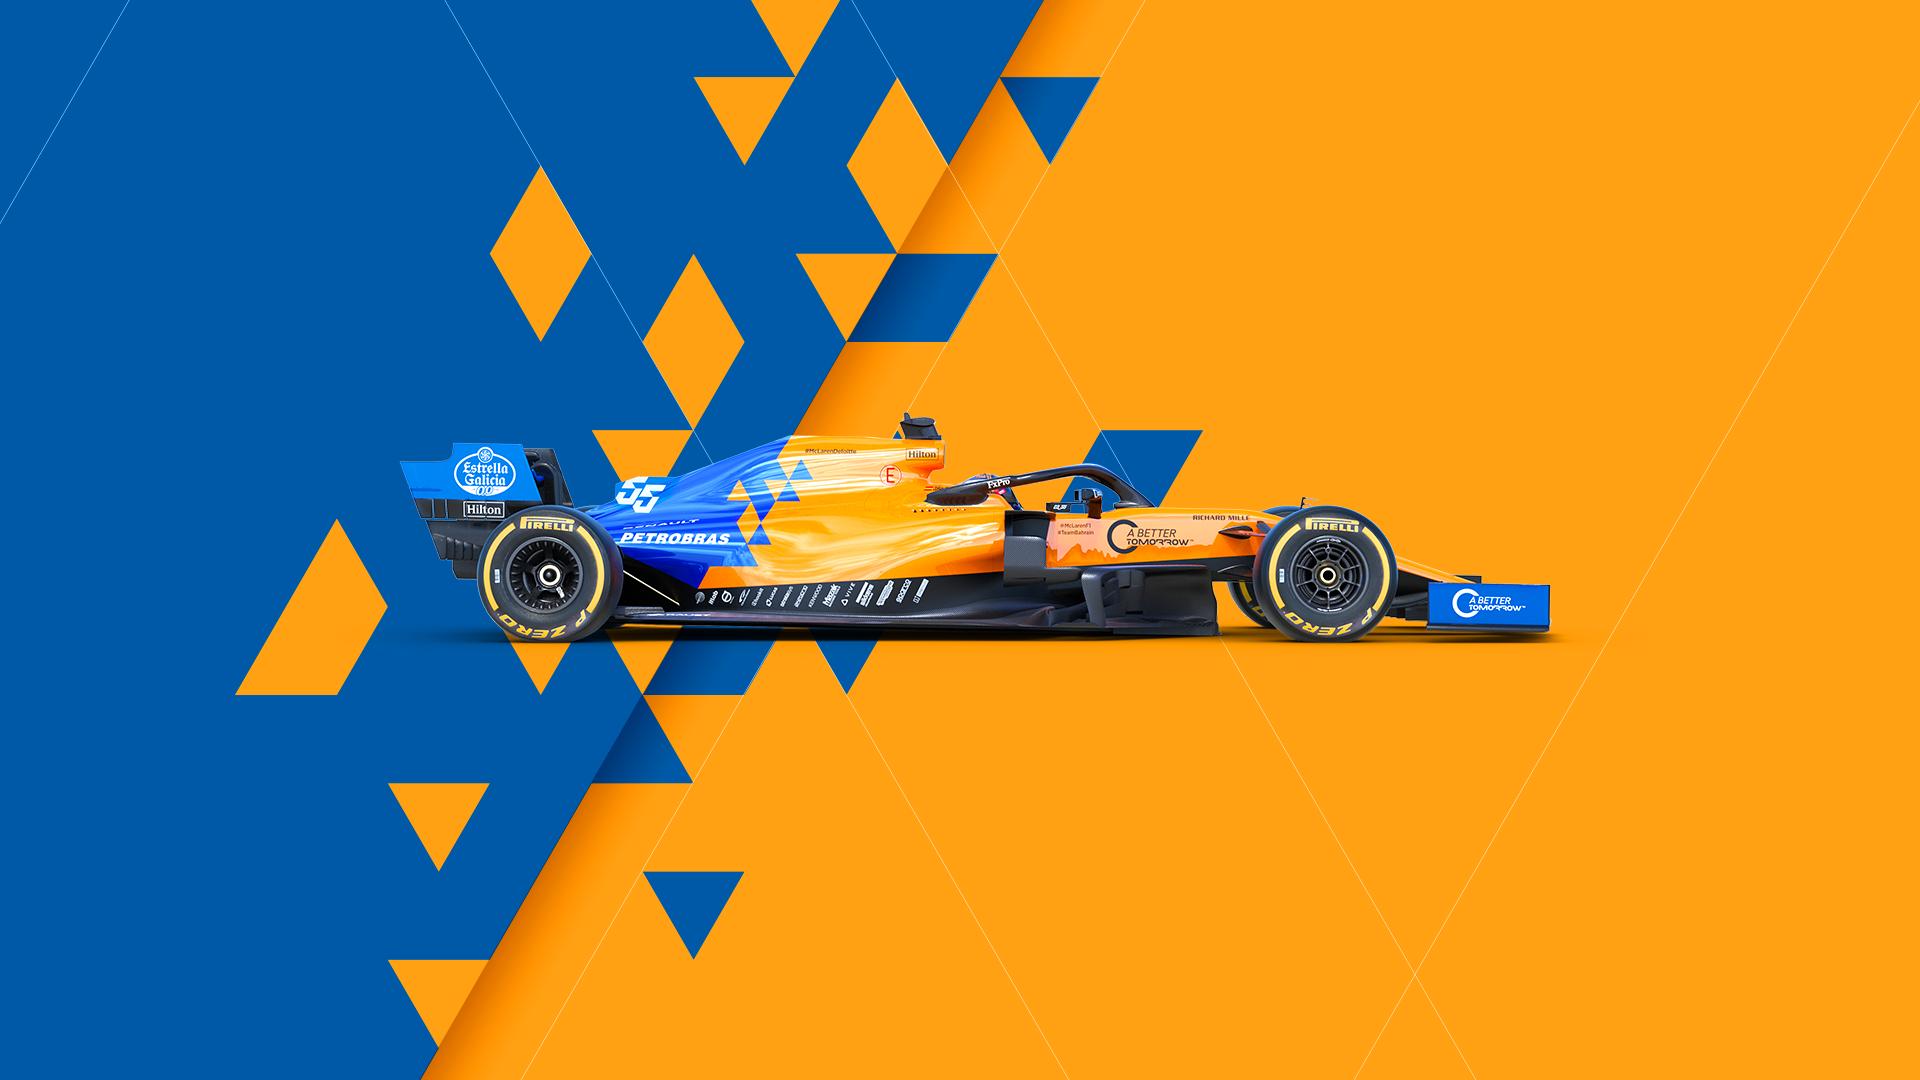 Fondos De Pantalla Fórmula 1 Mclaren Fórmula 1 2019 Year